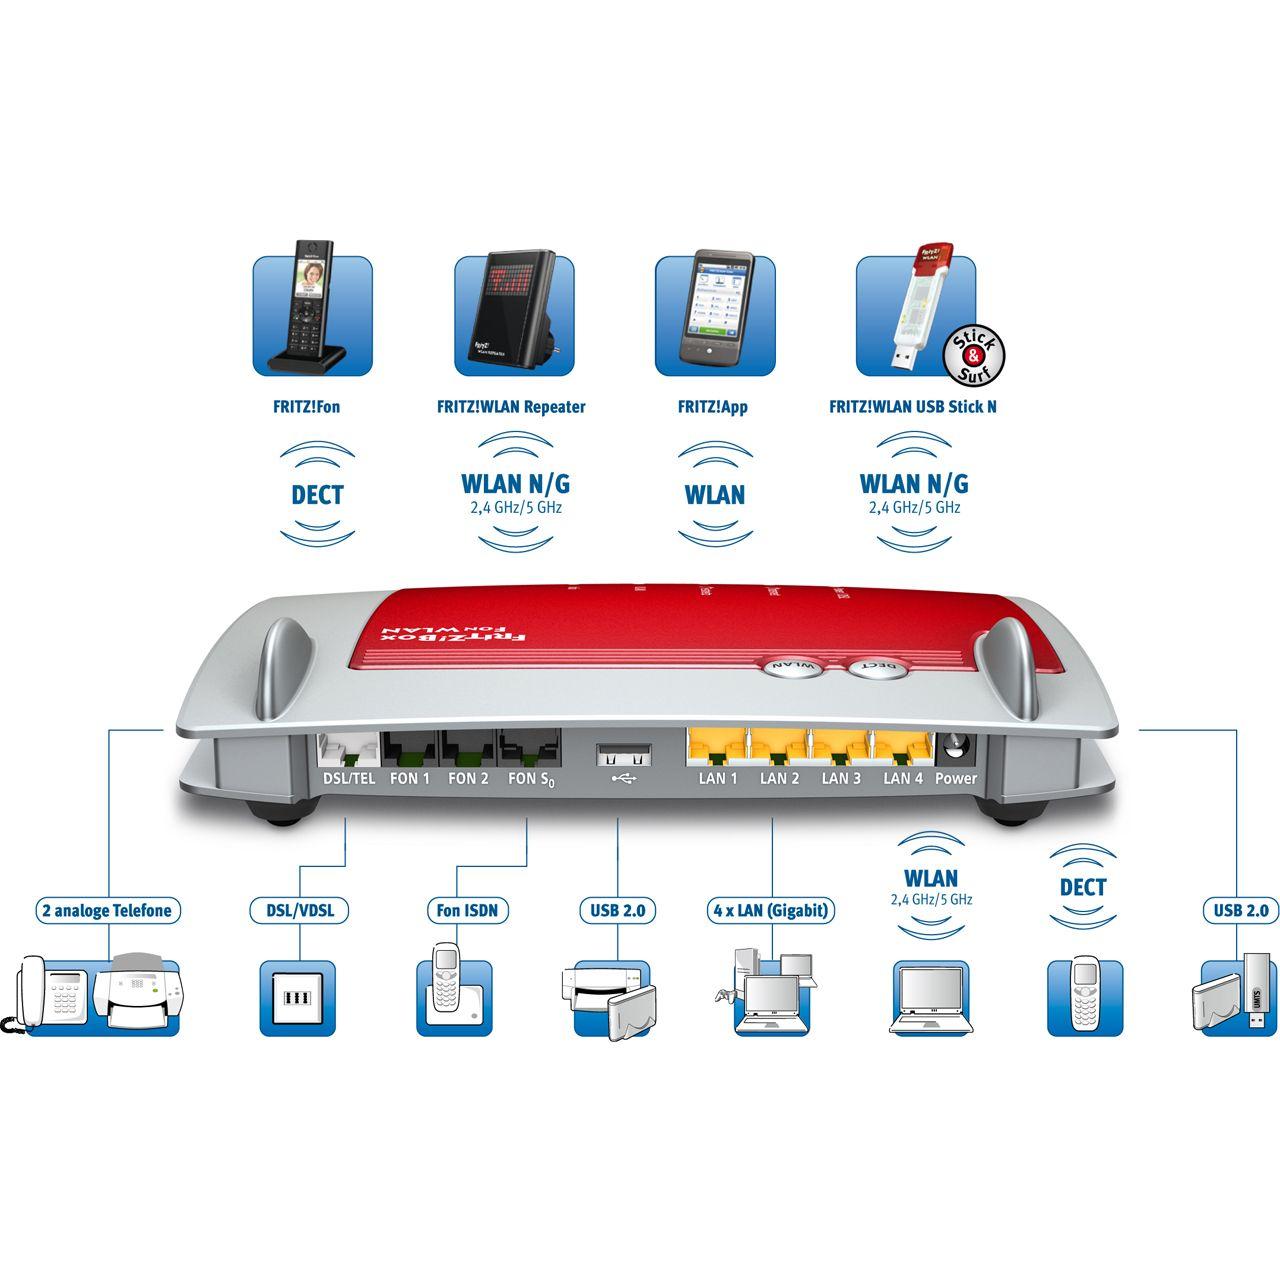 avm fritbox 7390 4 port router 300mbit s wlan router modem hardware. Black Bedroom Furniture Sets. Home Design Ideas